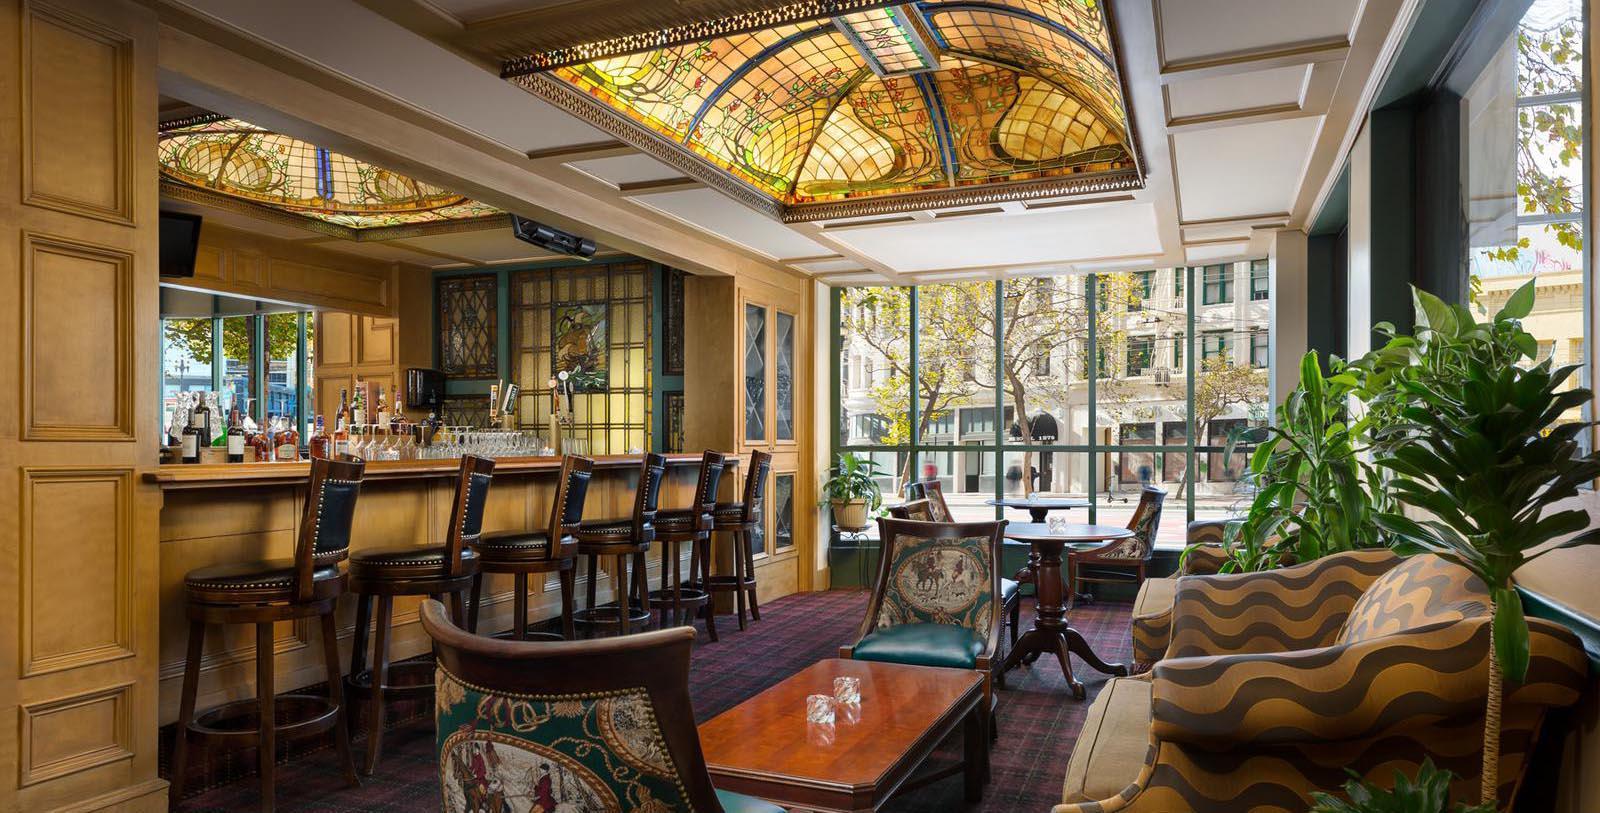 Image of Lobby Bar, Hotel Whitcomb in San Francisco, California, 1916, Member of Historic Hotels of America, Taste